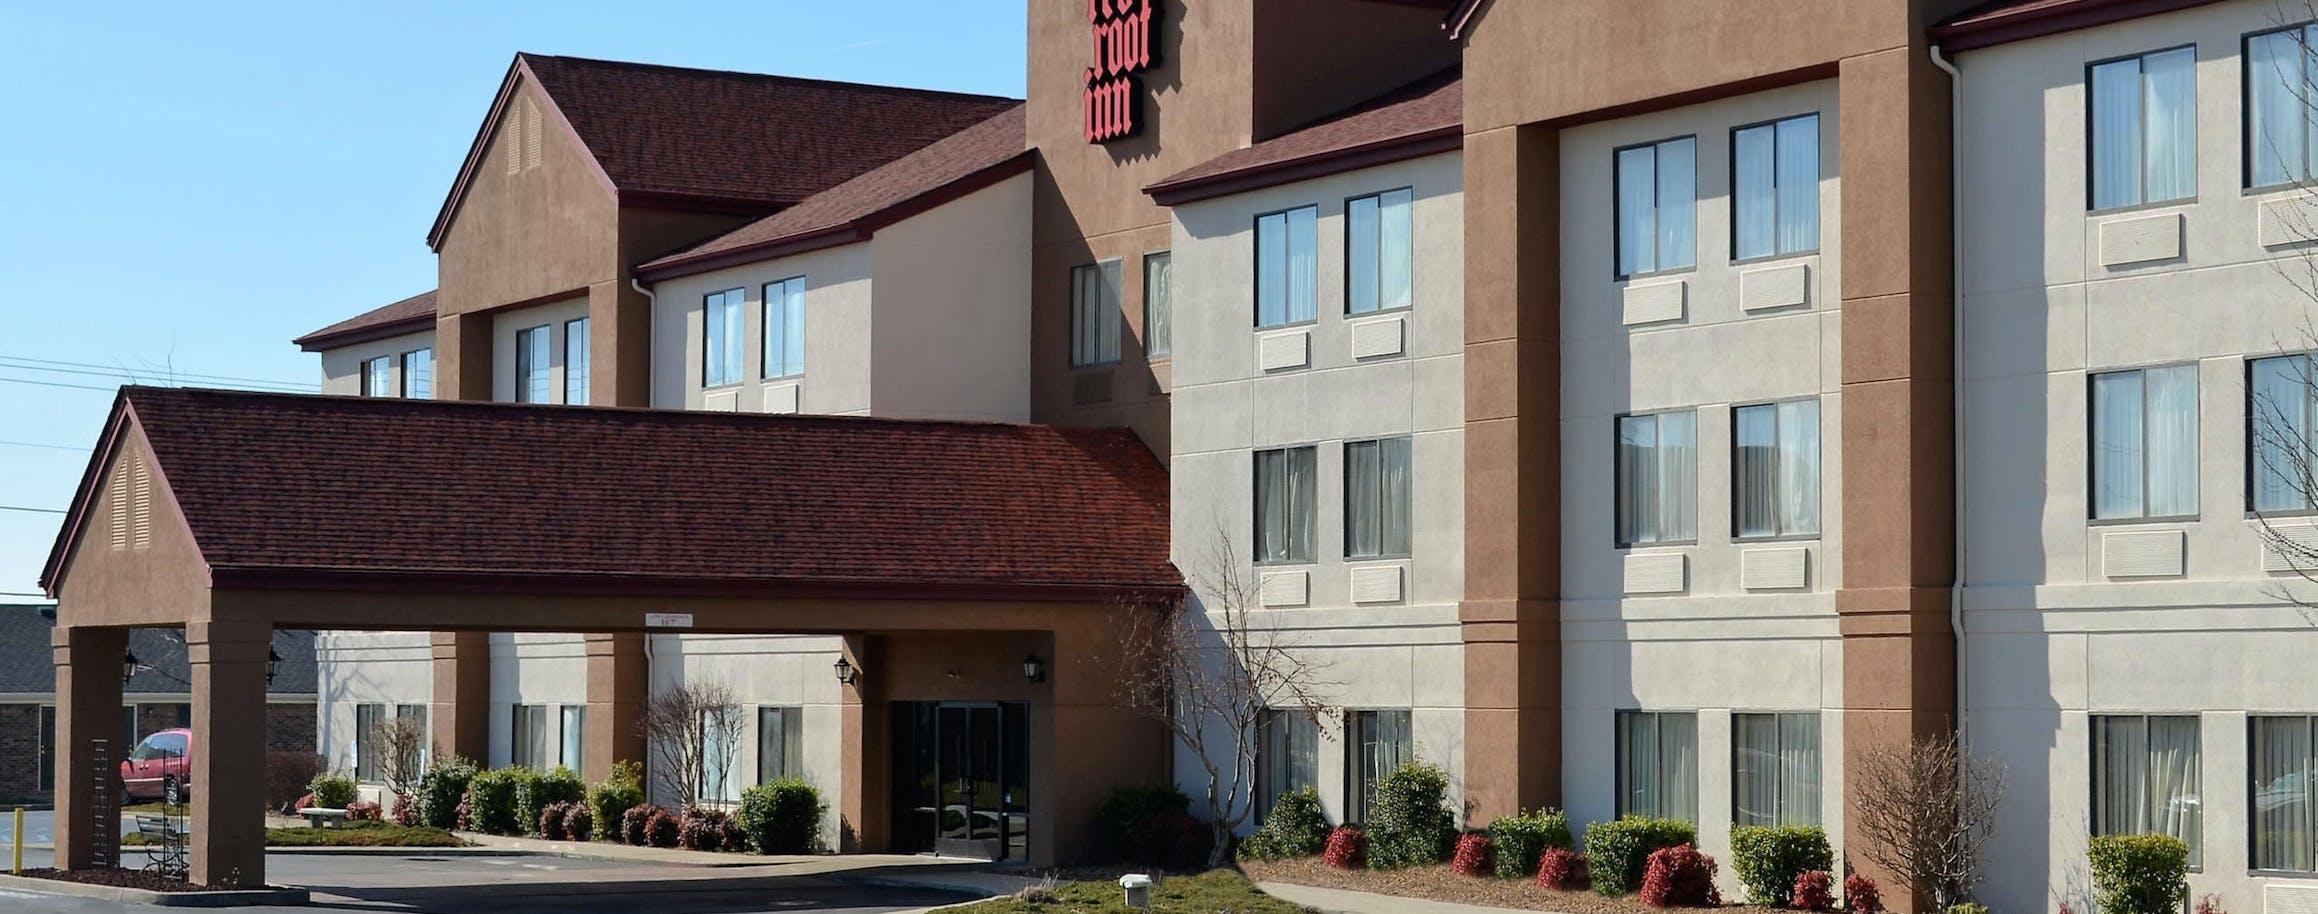 Red Roof Inn Richmond Ky Lexington Ky Hoteltonight